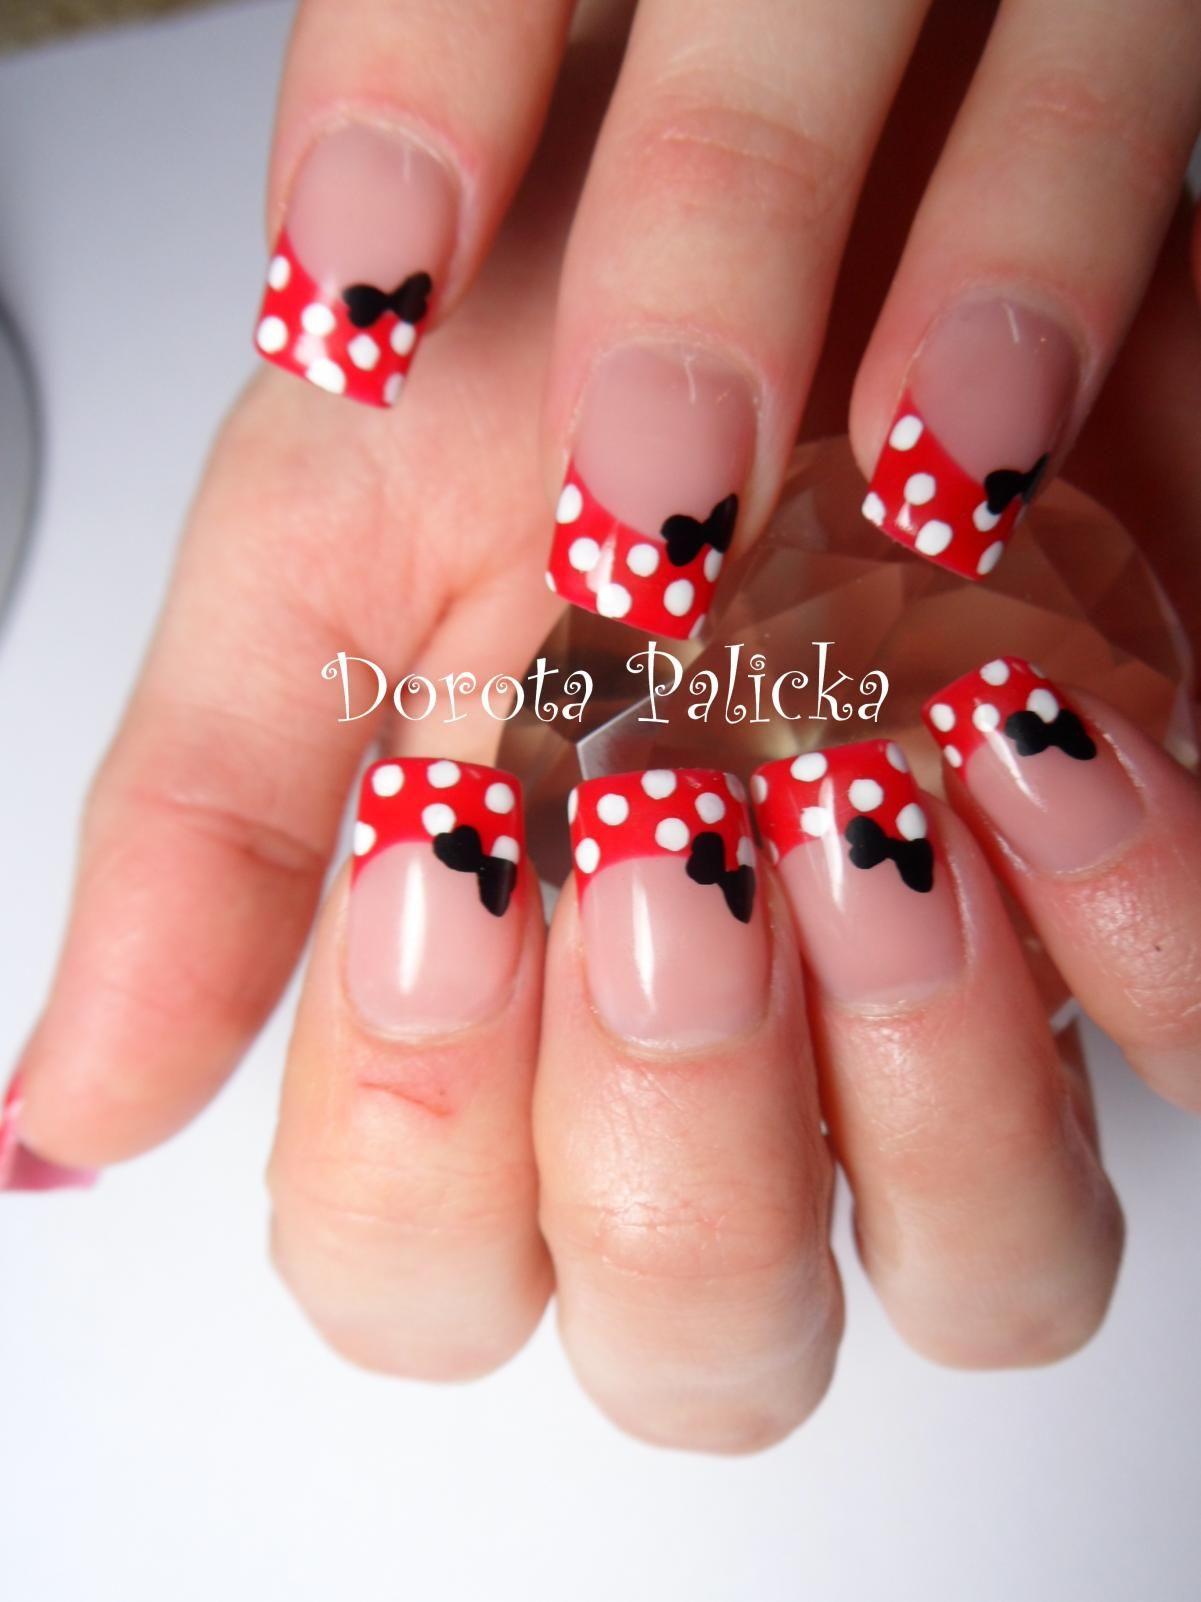 shellac nails | Sharpie & Shellac? - Page 2 - Salon Geek ...